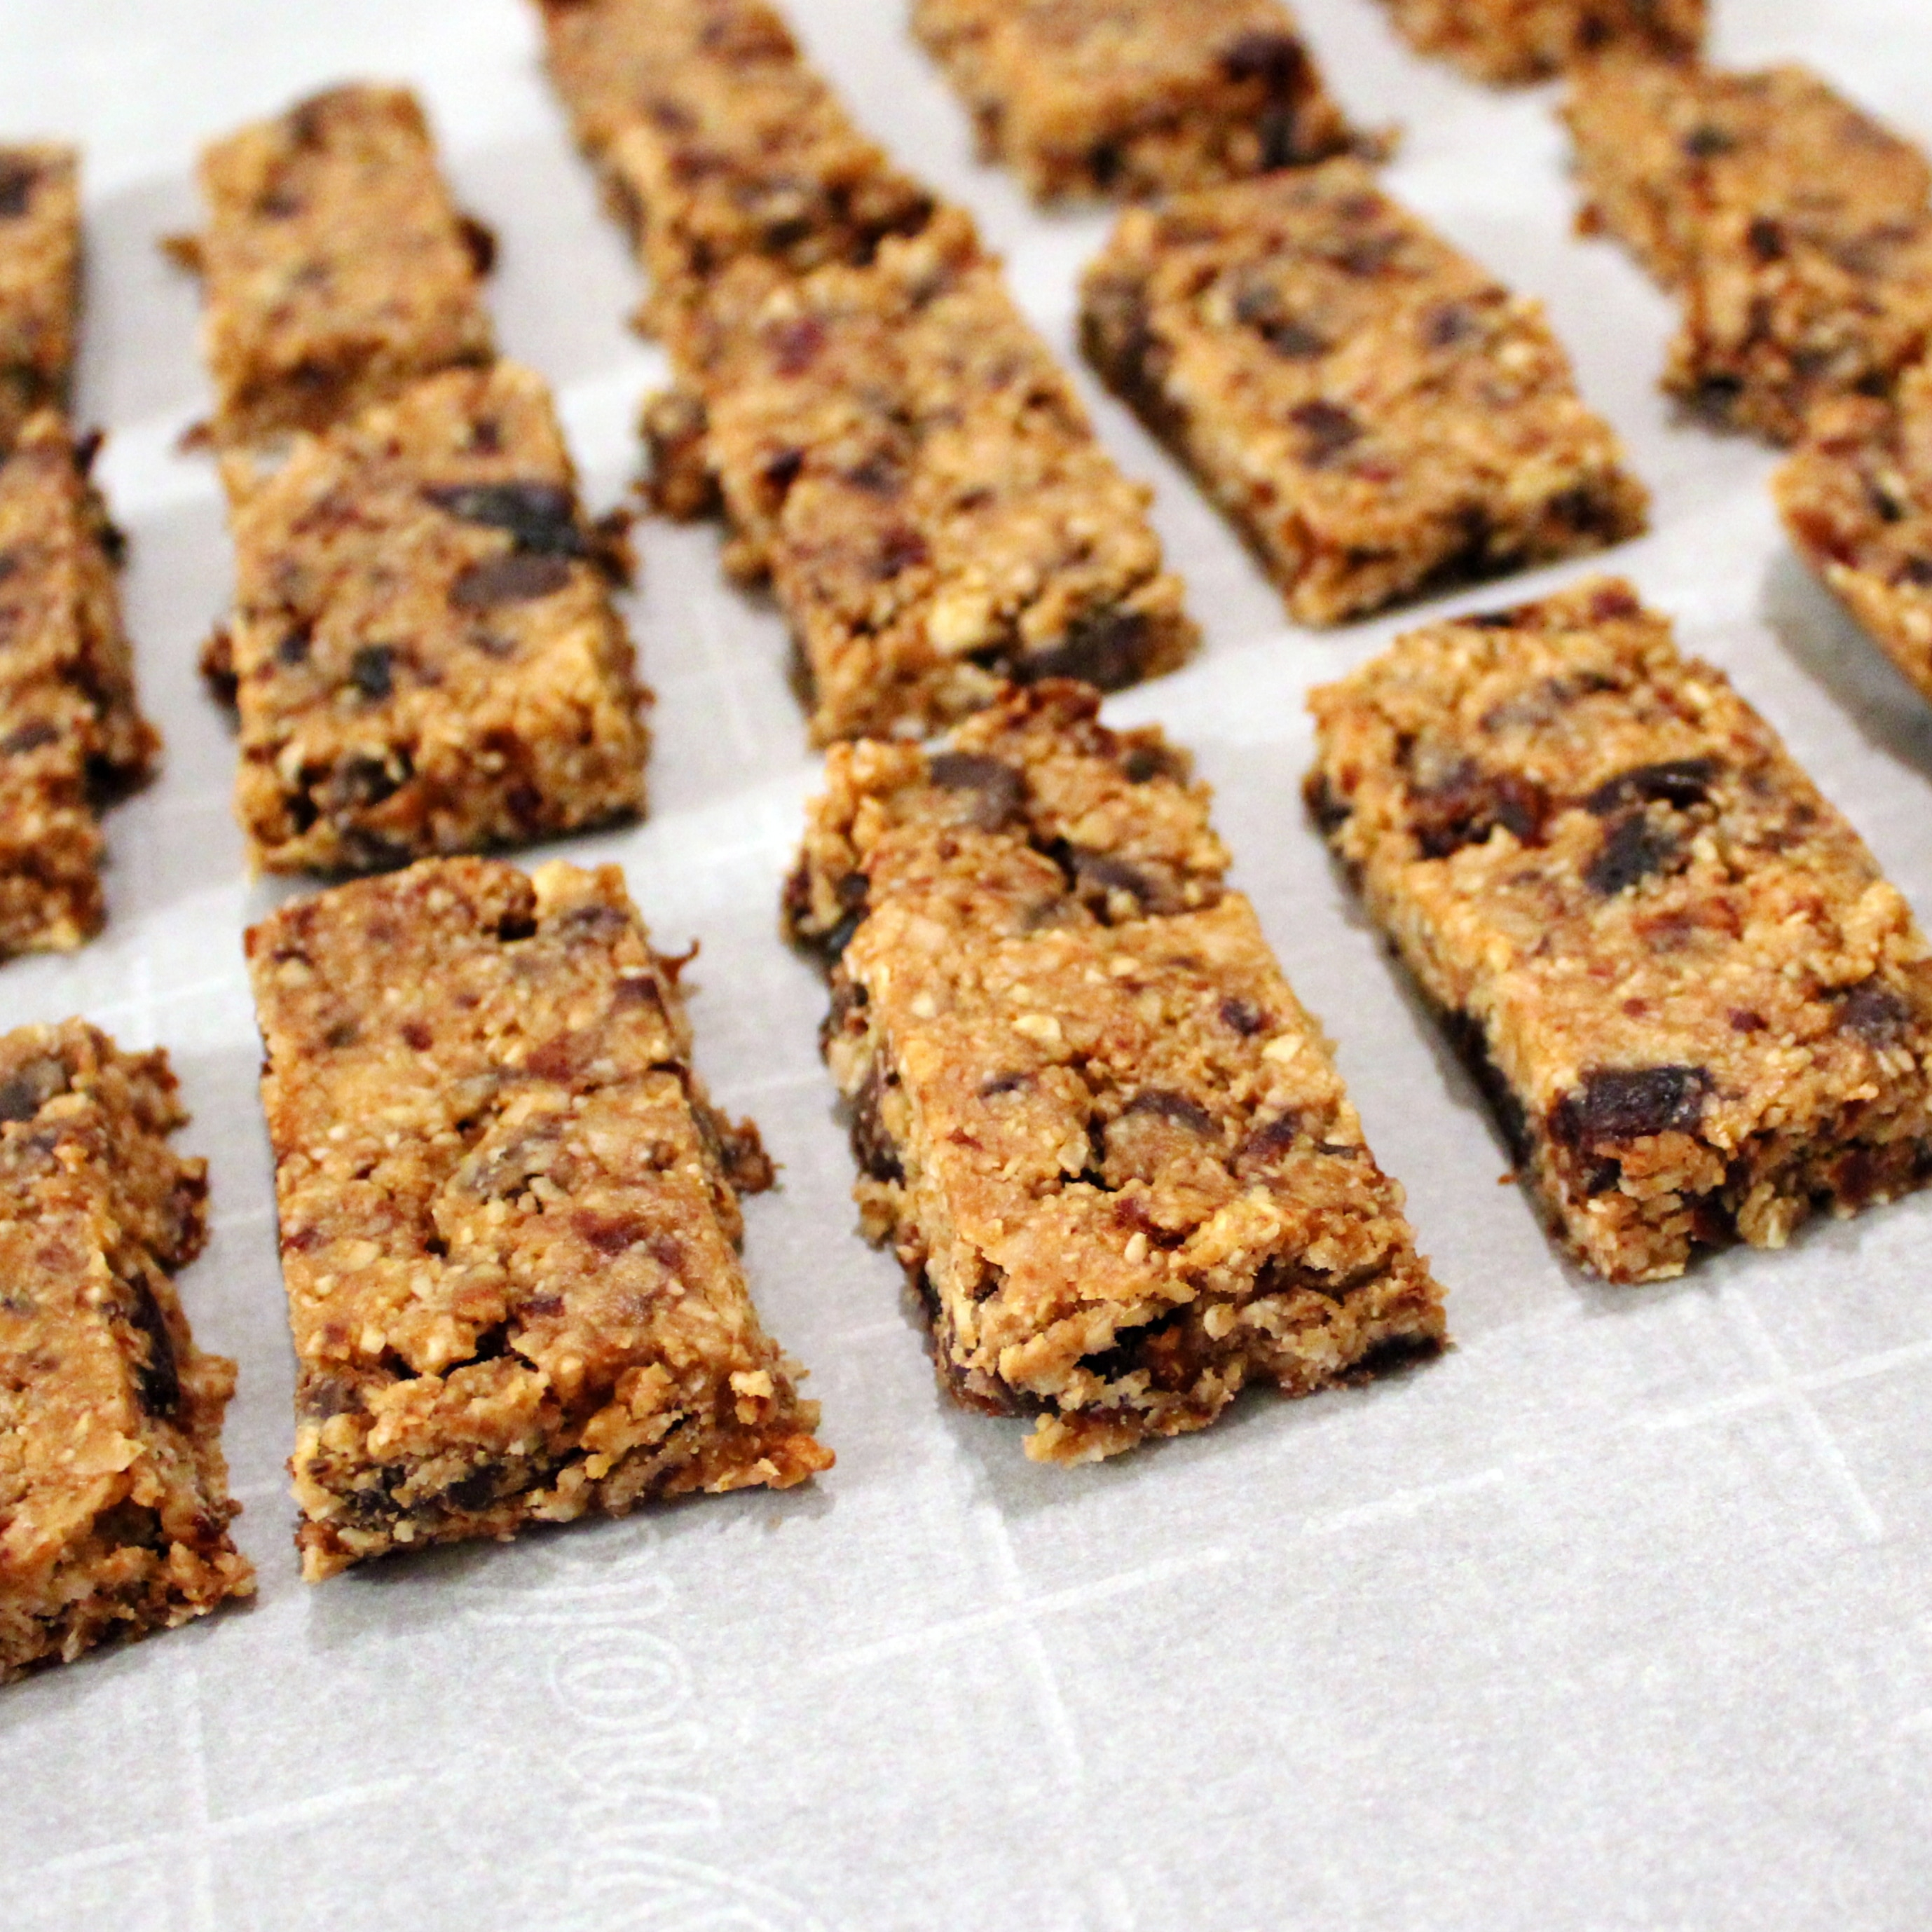 Dried Cherry No-Bake Cookies